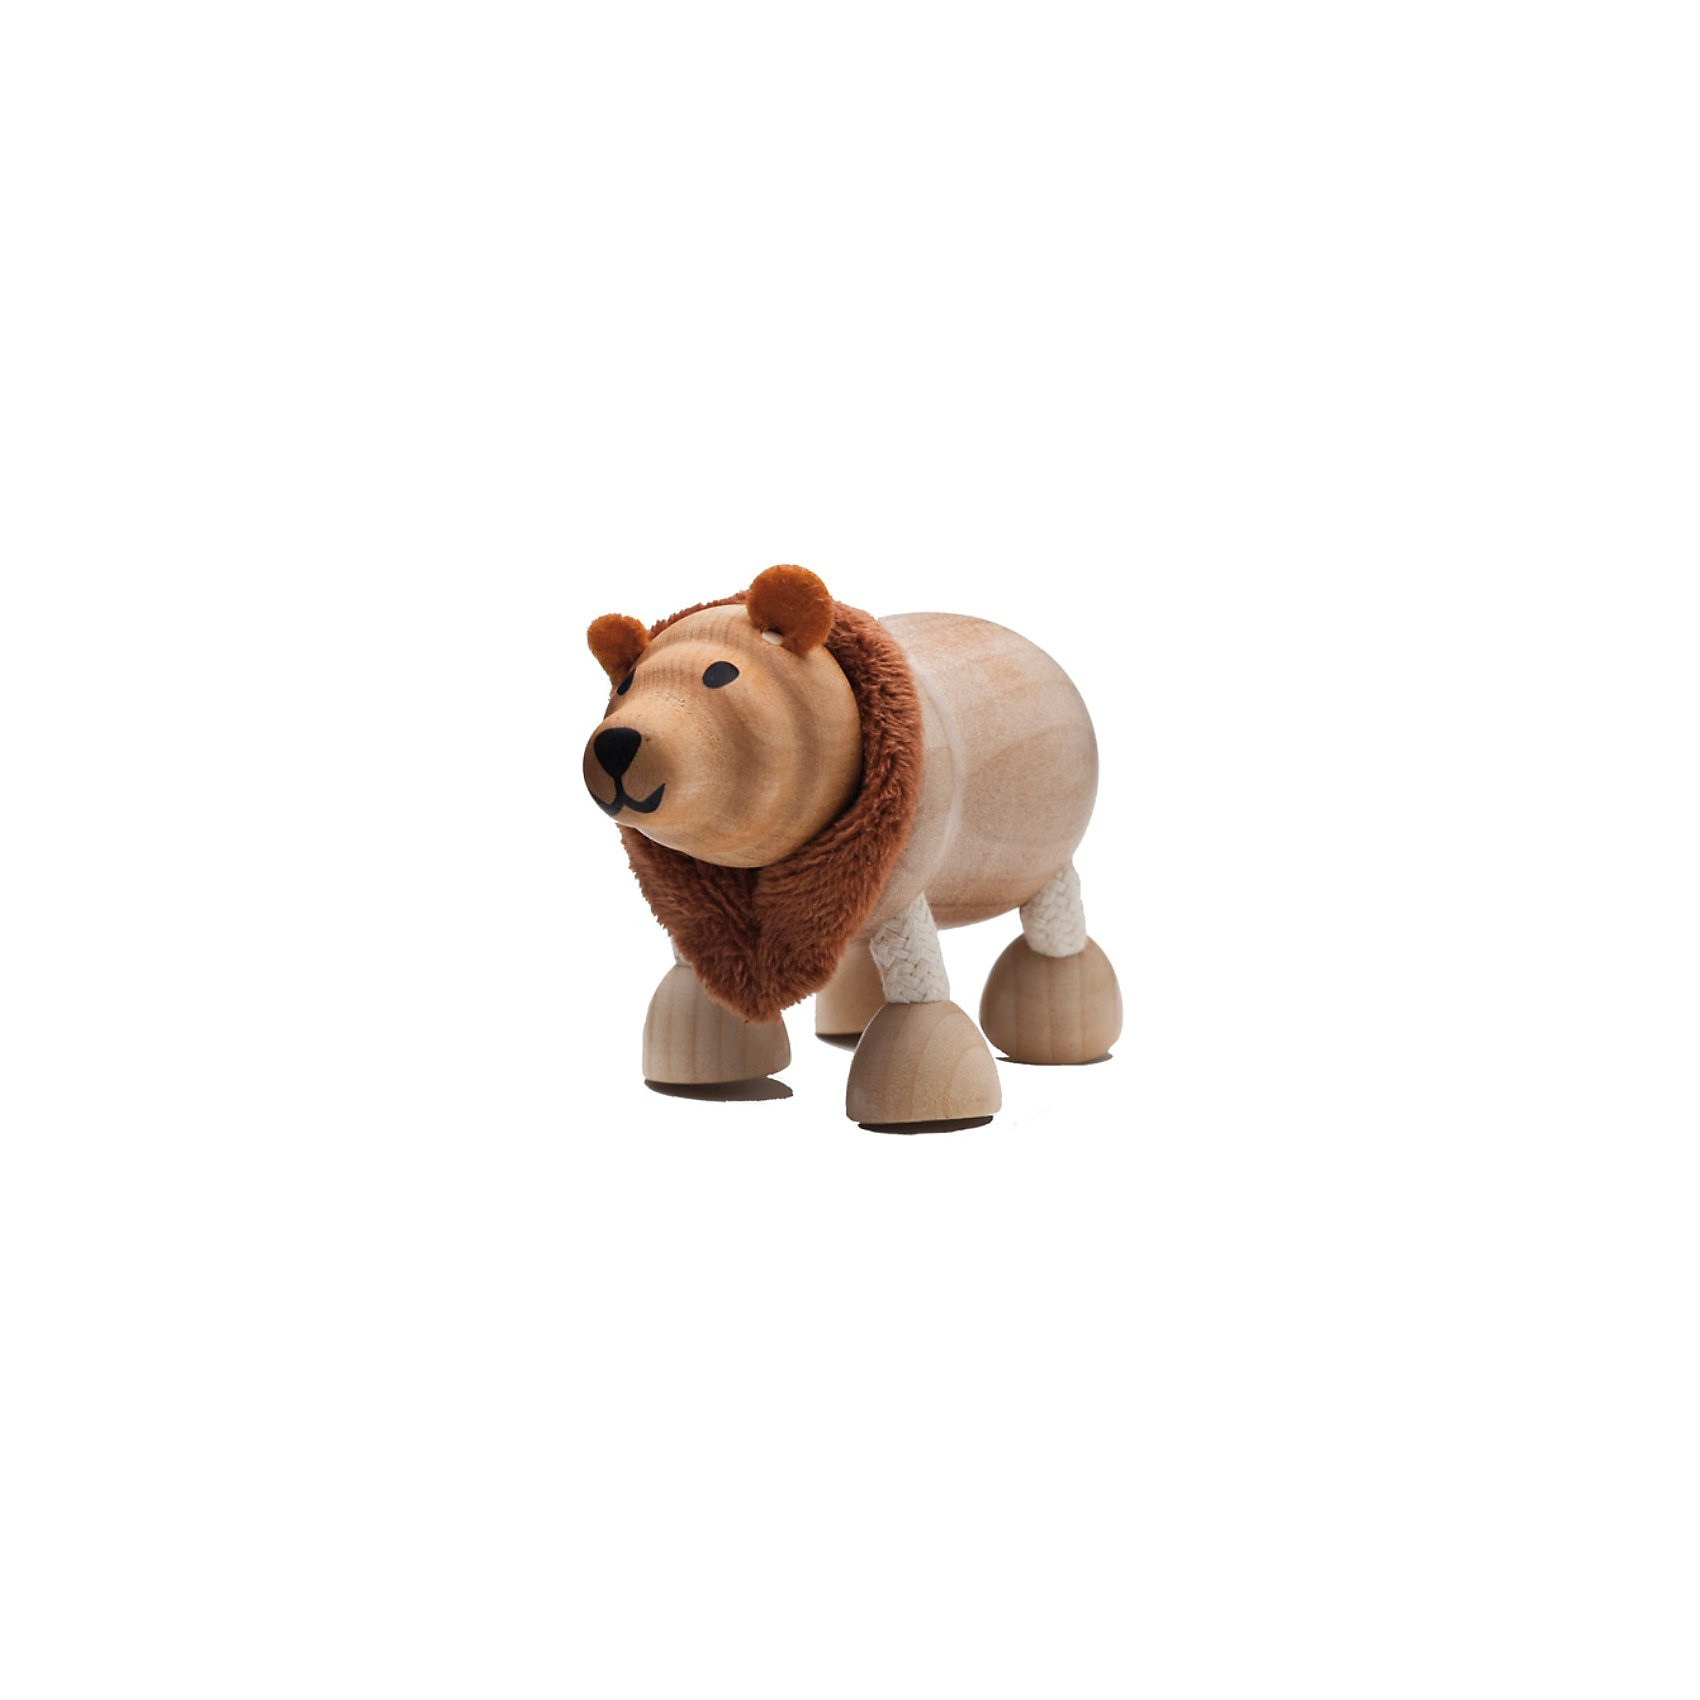 AnaMalz Бурый мишка, AnaMalz фигурки игрушки anamalz anamalz игровое поле